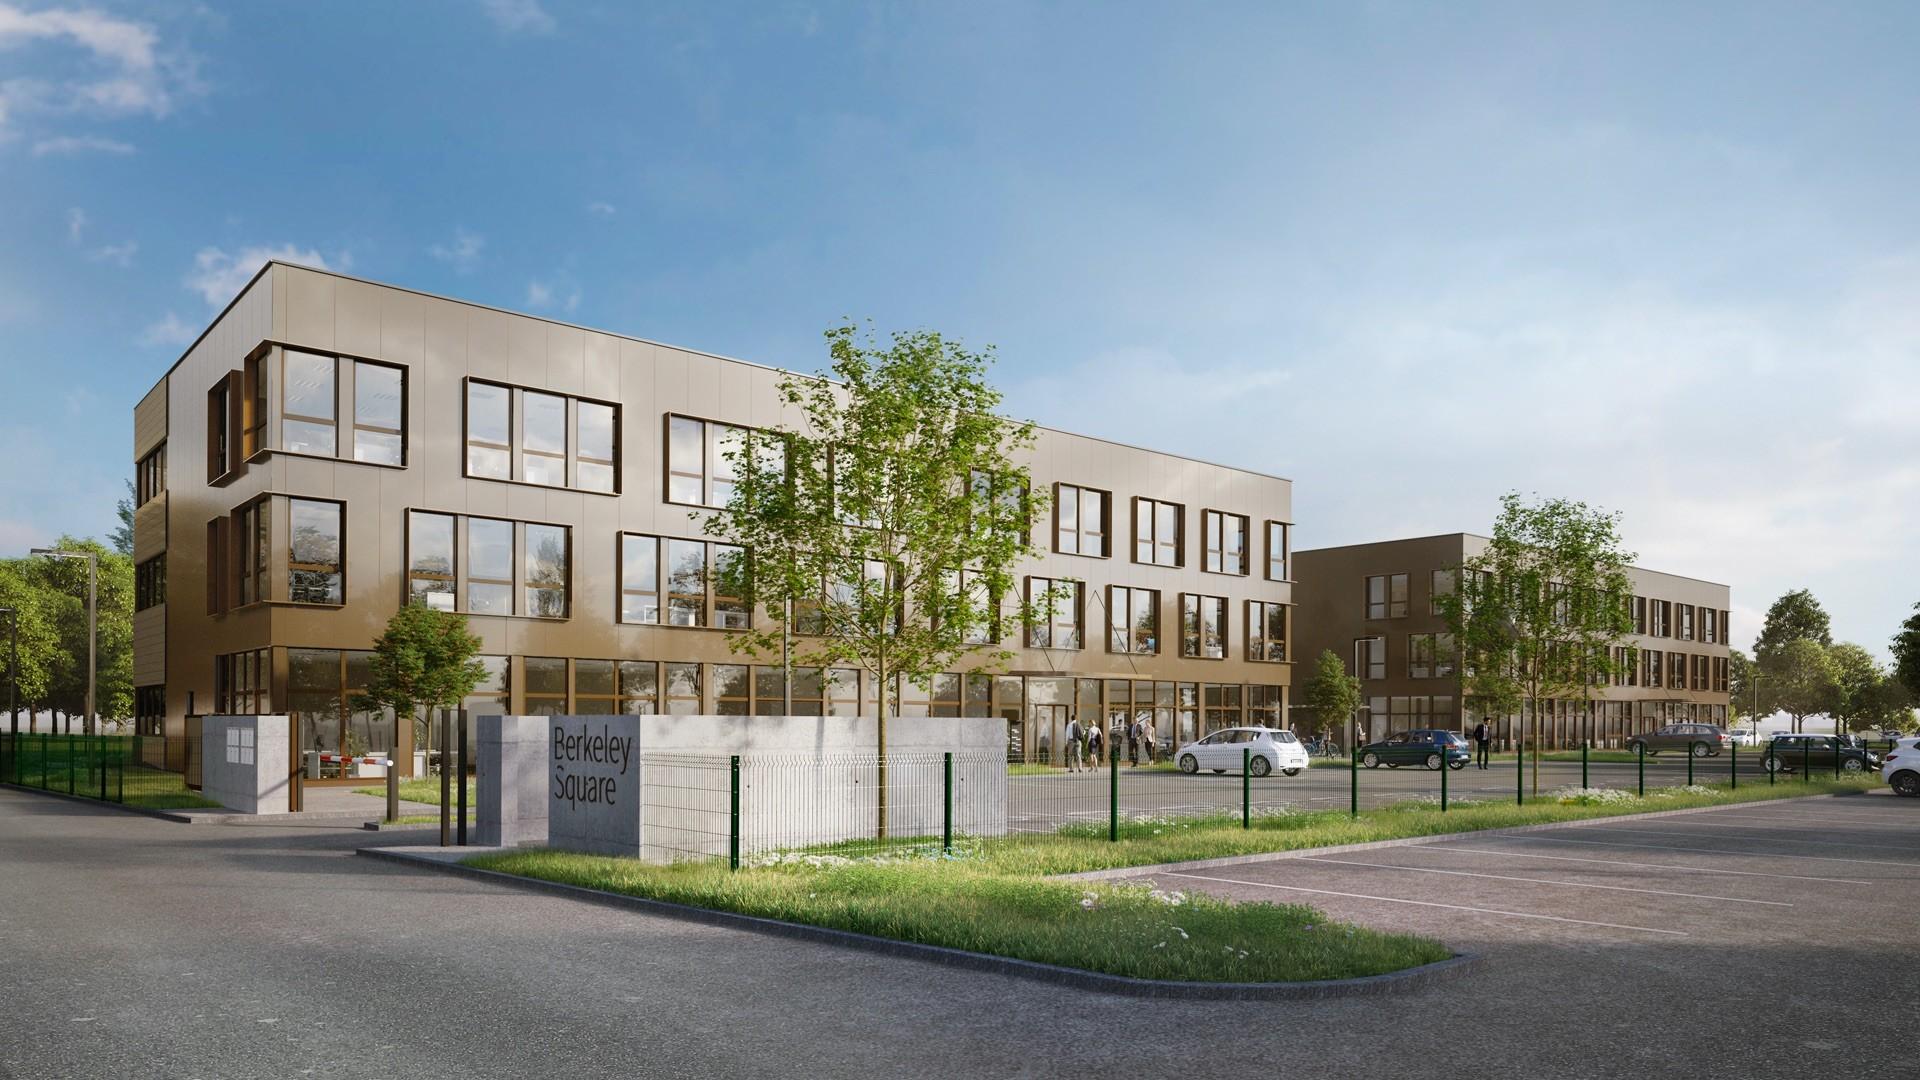 Berkeley Square Saint-Herblain Nantes Lazard Group Bureaux